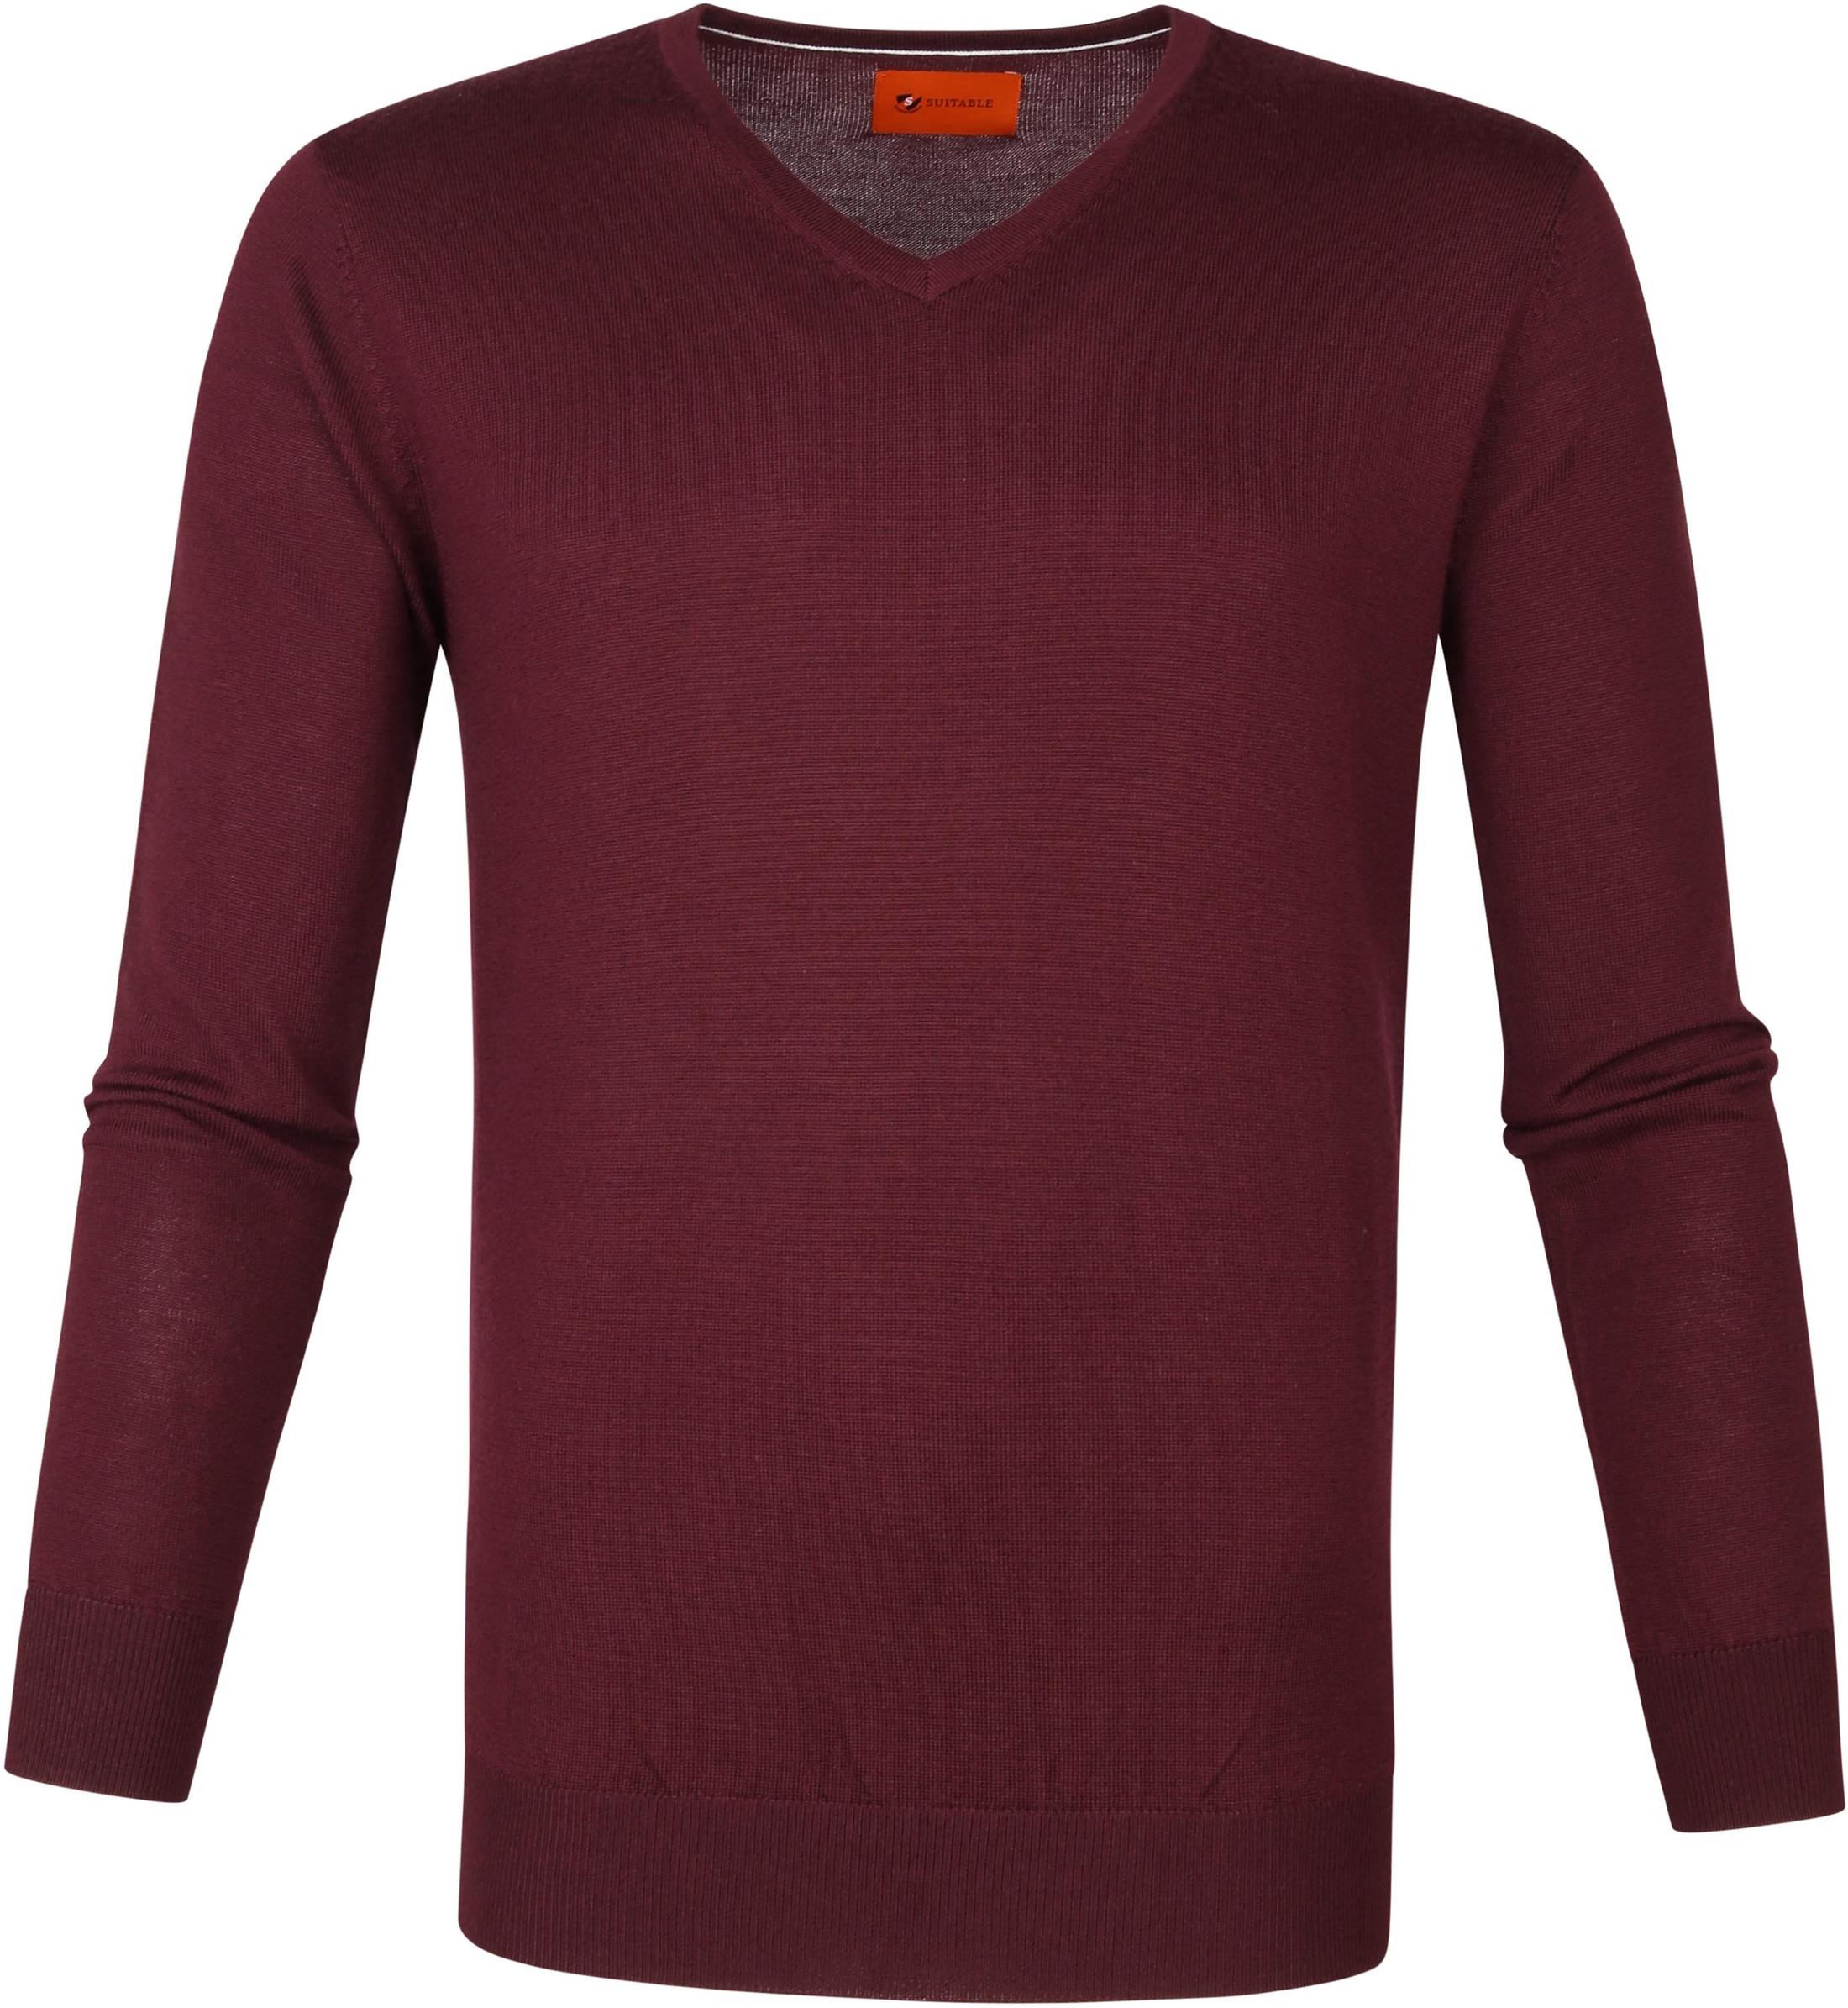 Suitable Merino Pullover Aron Burgundy Red